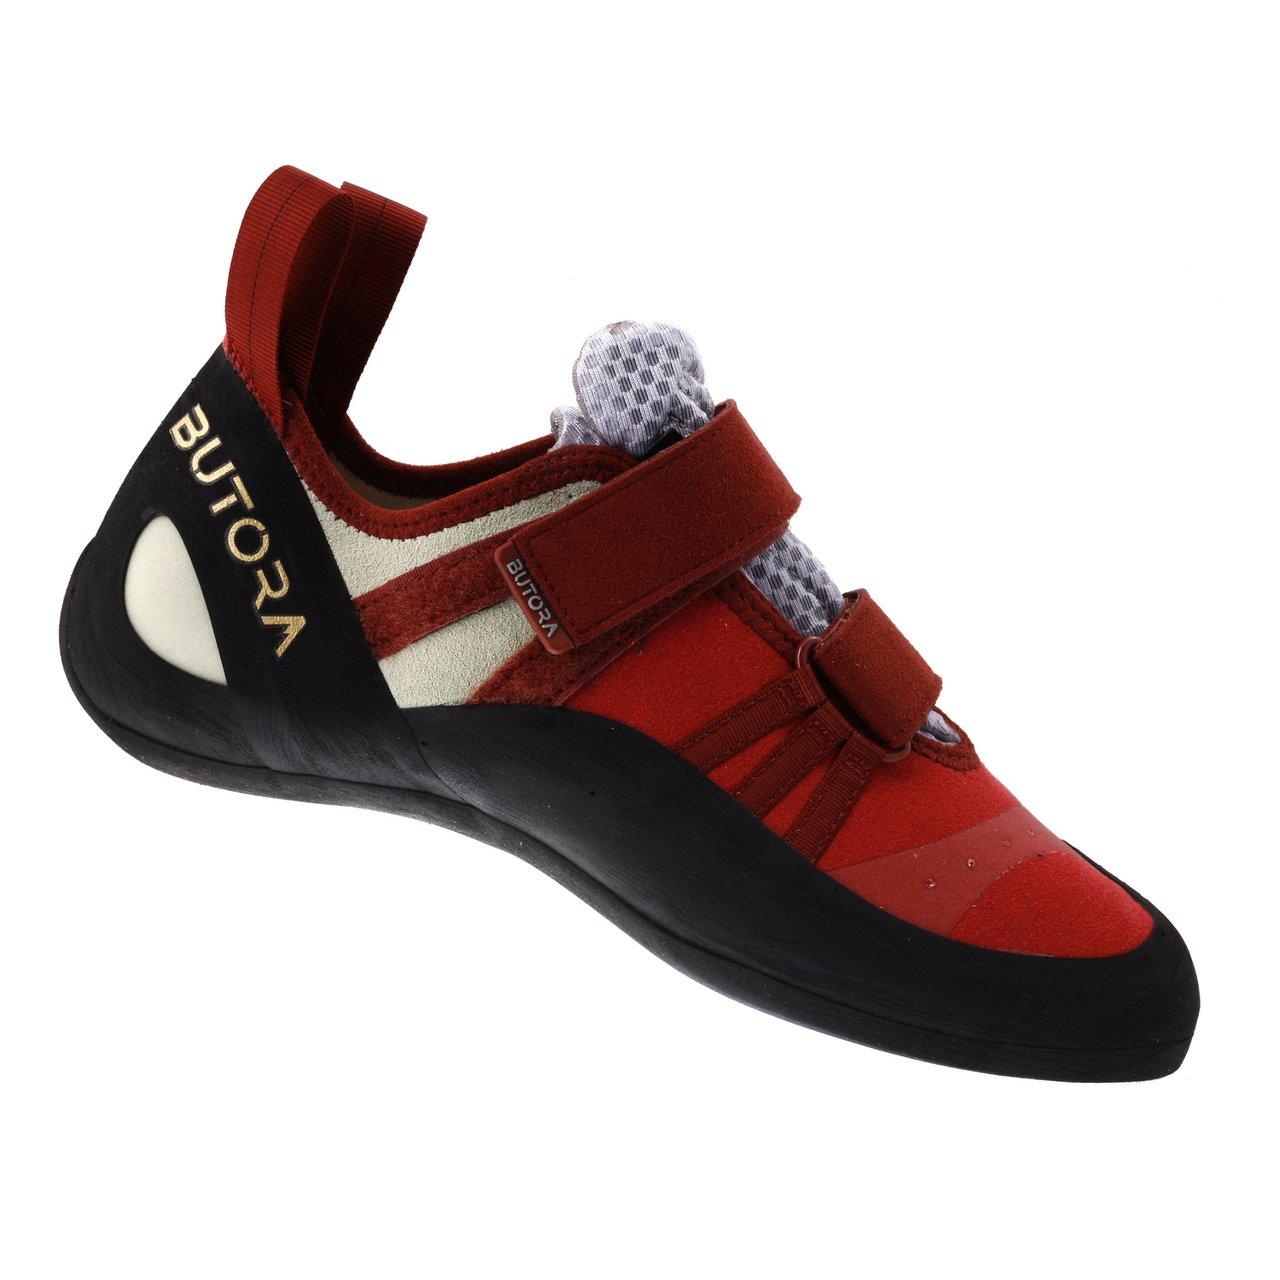 Butora Endeavor Wide Fit Climbing Shoe - Women's Crimson 8